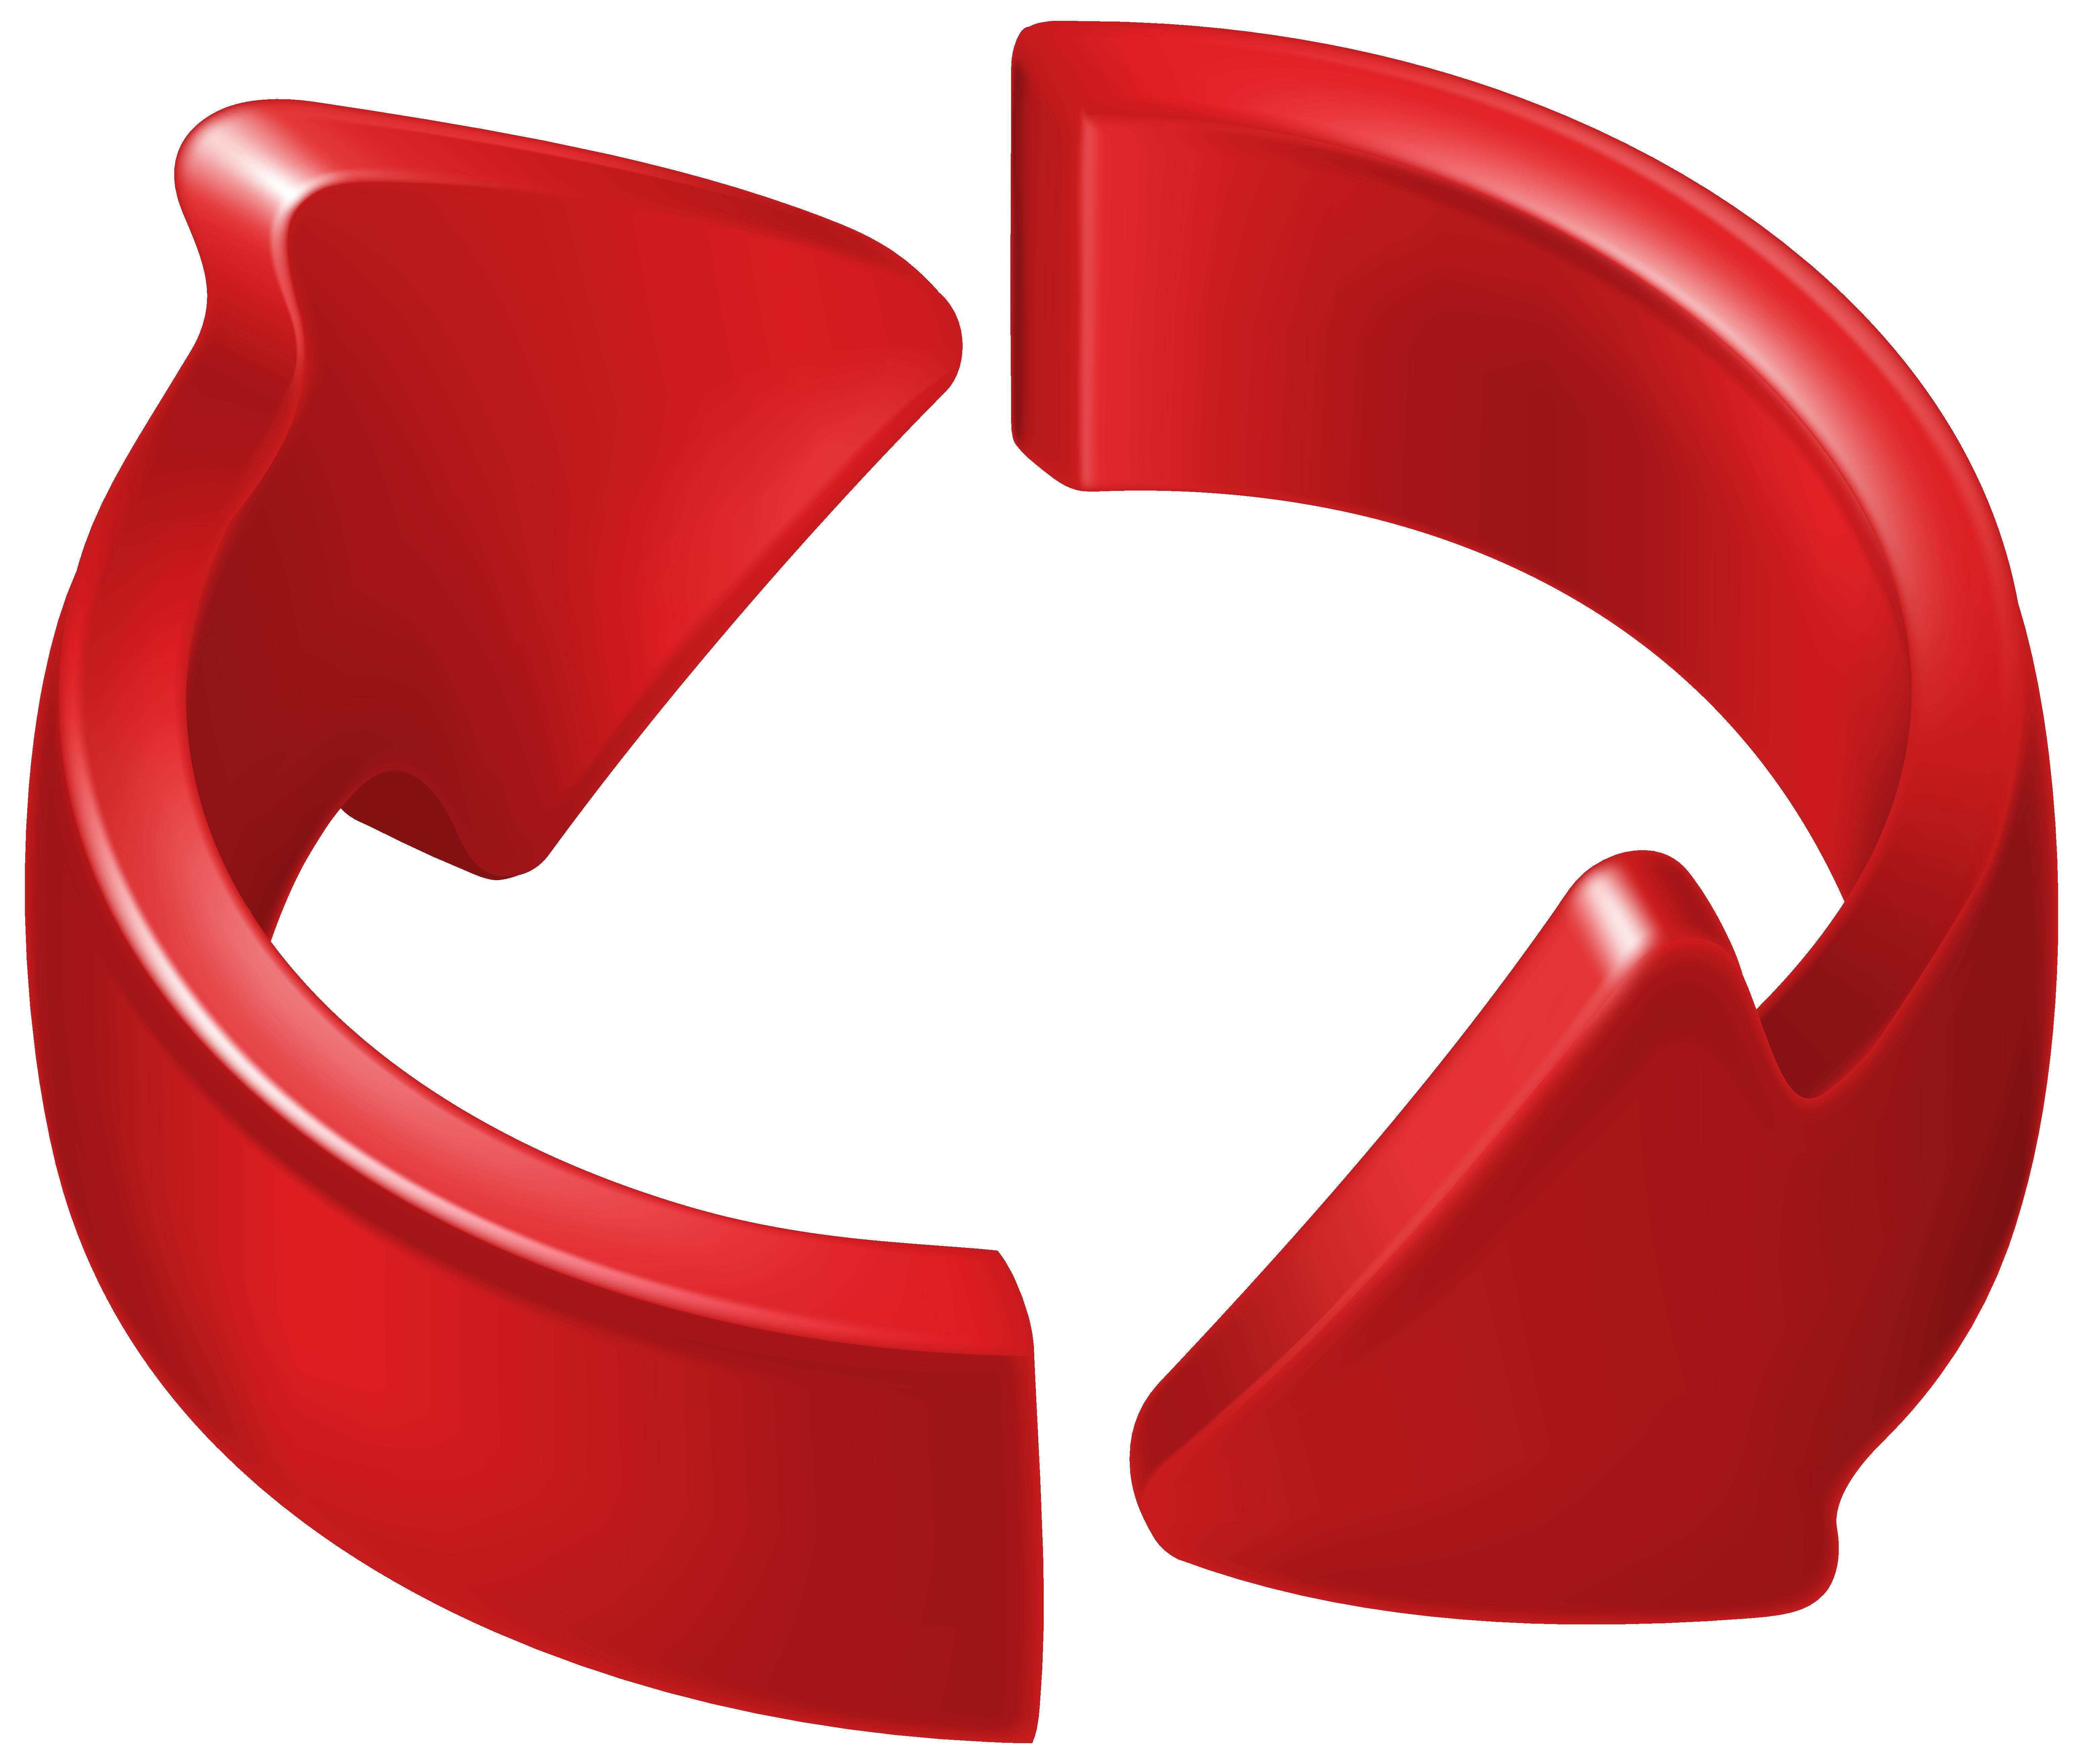 clip free library Arrow circle clipart. Transparent png clip art.